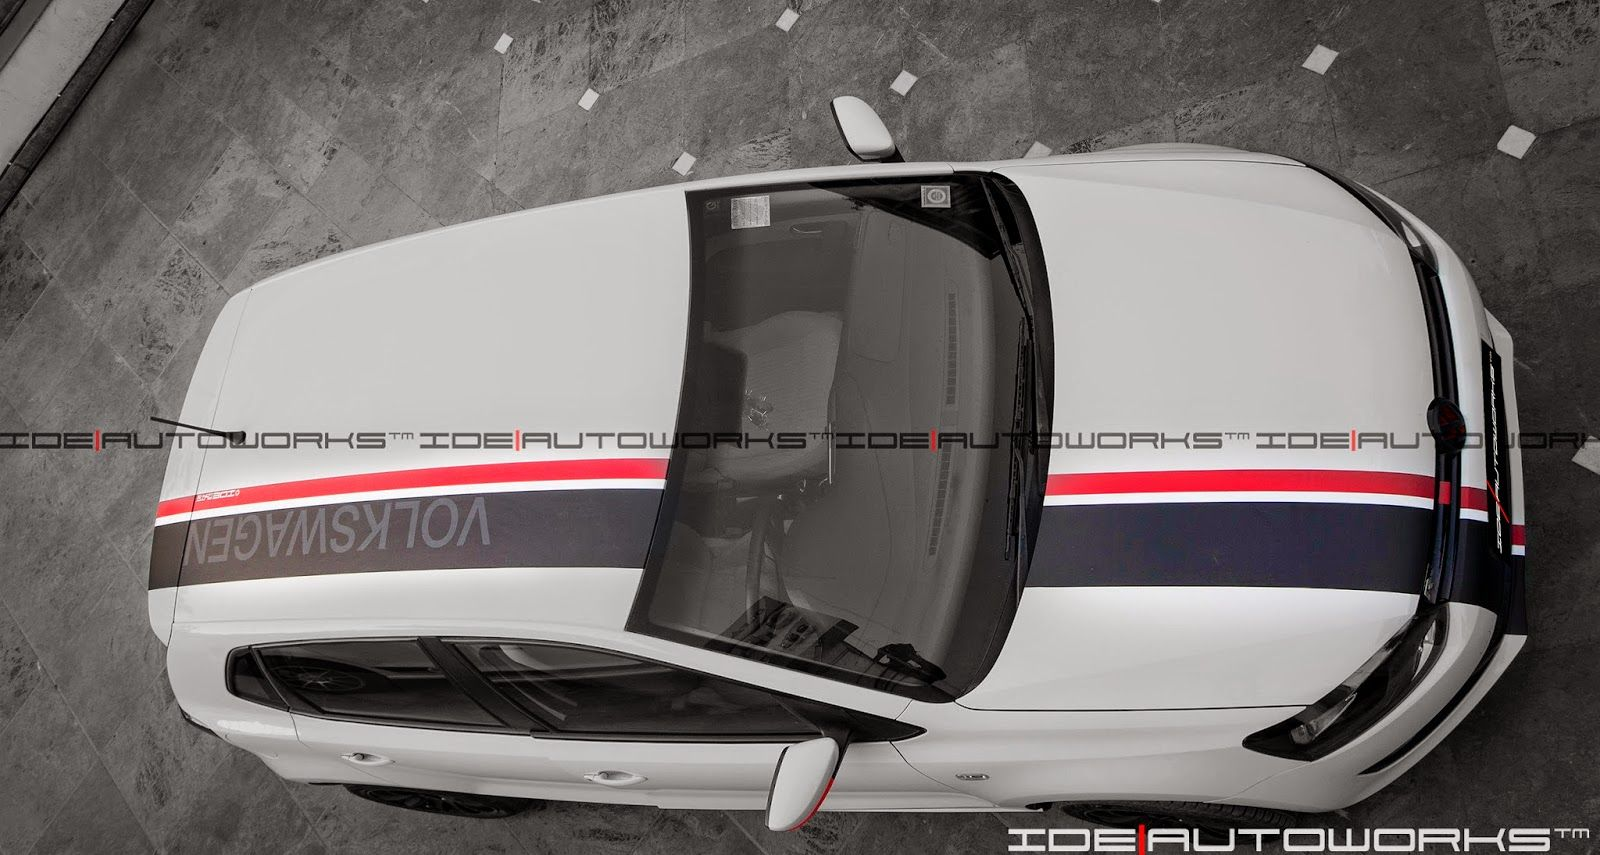 Vw Polo With Customized Racing Stripes Autos Brujula [ 855 x 1600 Pixel ]